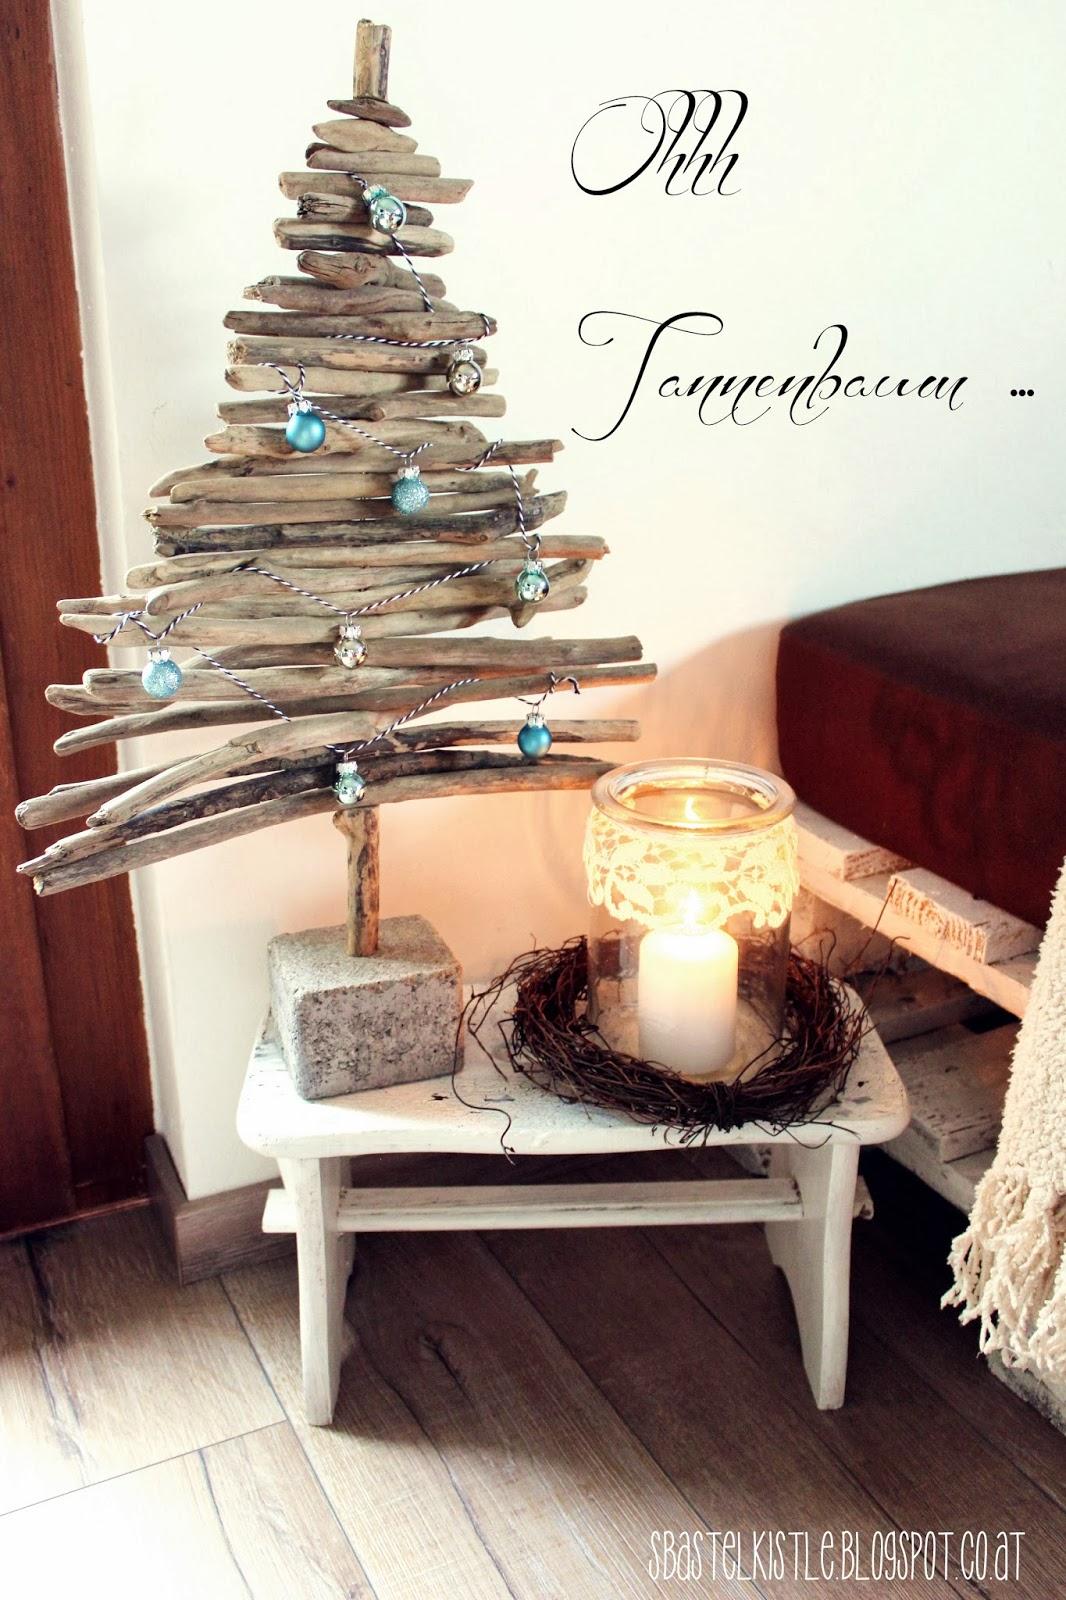 s 39 bastelkistle ohhh tannenbaum. Black Bedroom Furniture Sets. Home Design Ideas